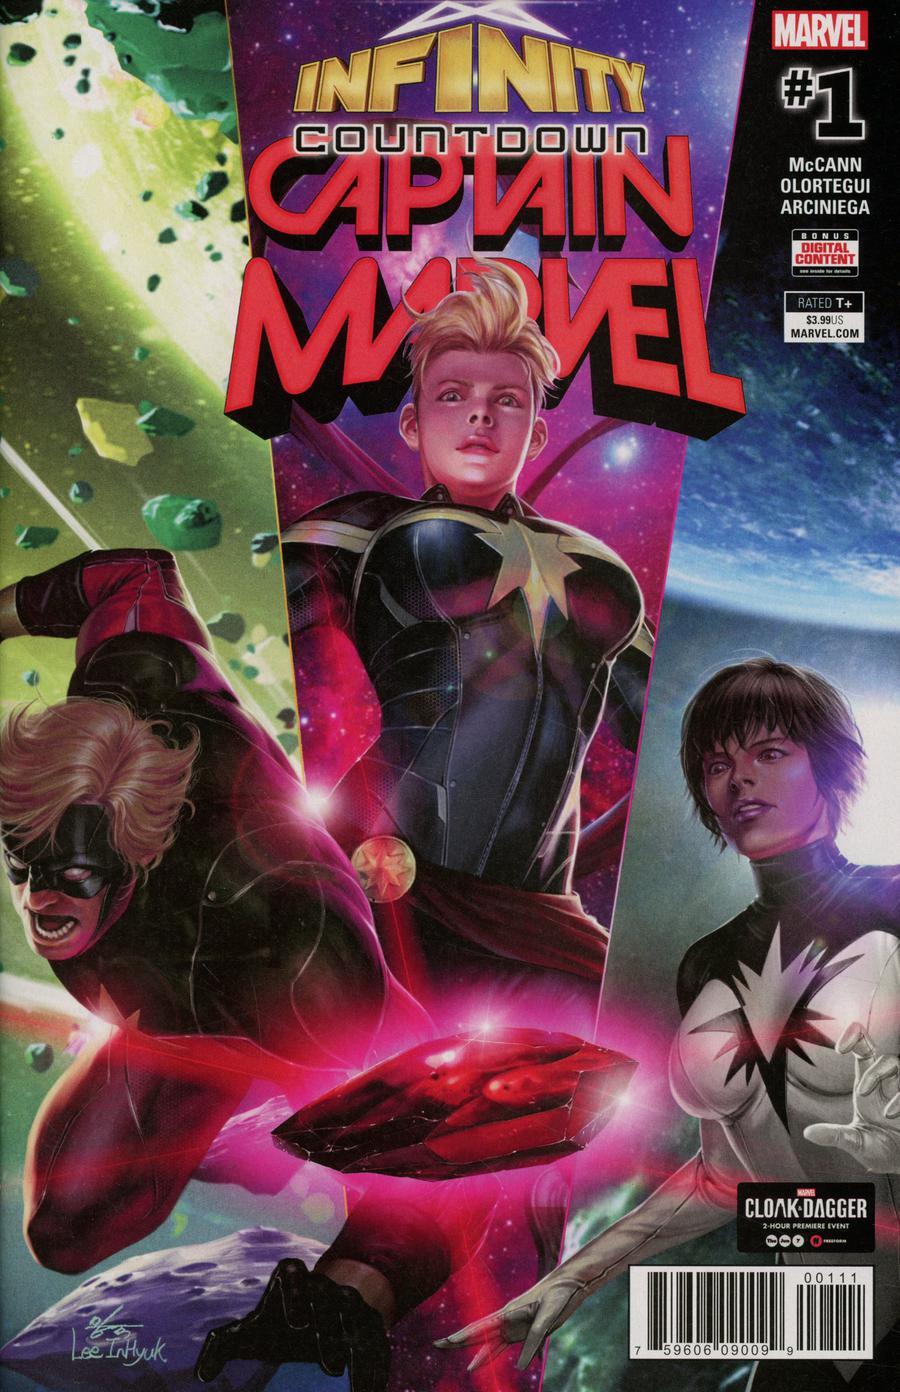 Infinity Countdown Captain Marvel #1 Cover A 1st Ptg Regular In-Hyuk Lee Cover